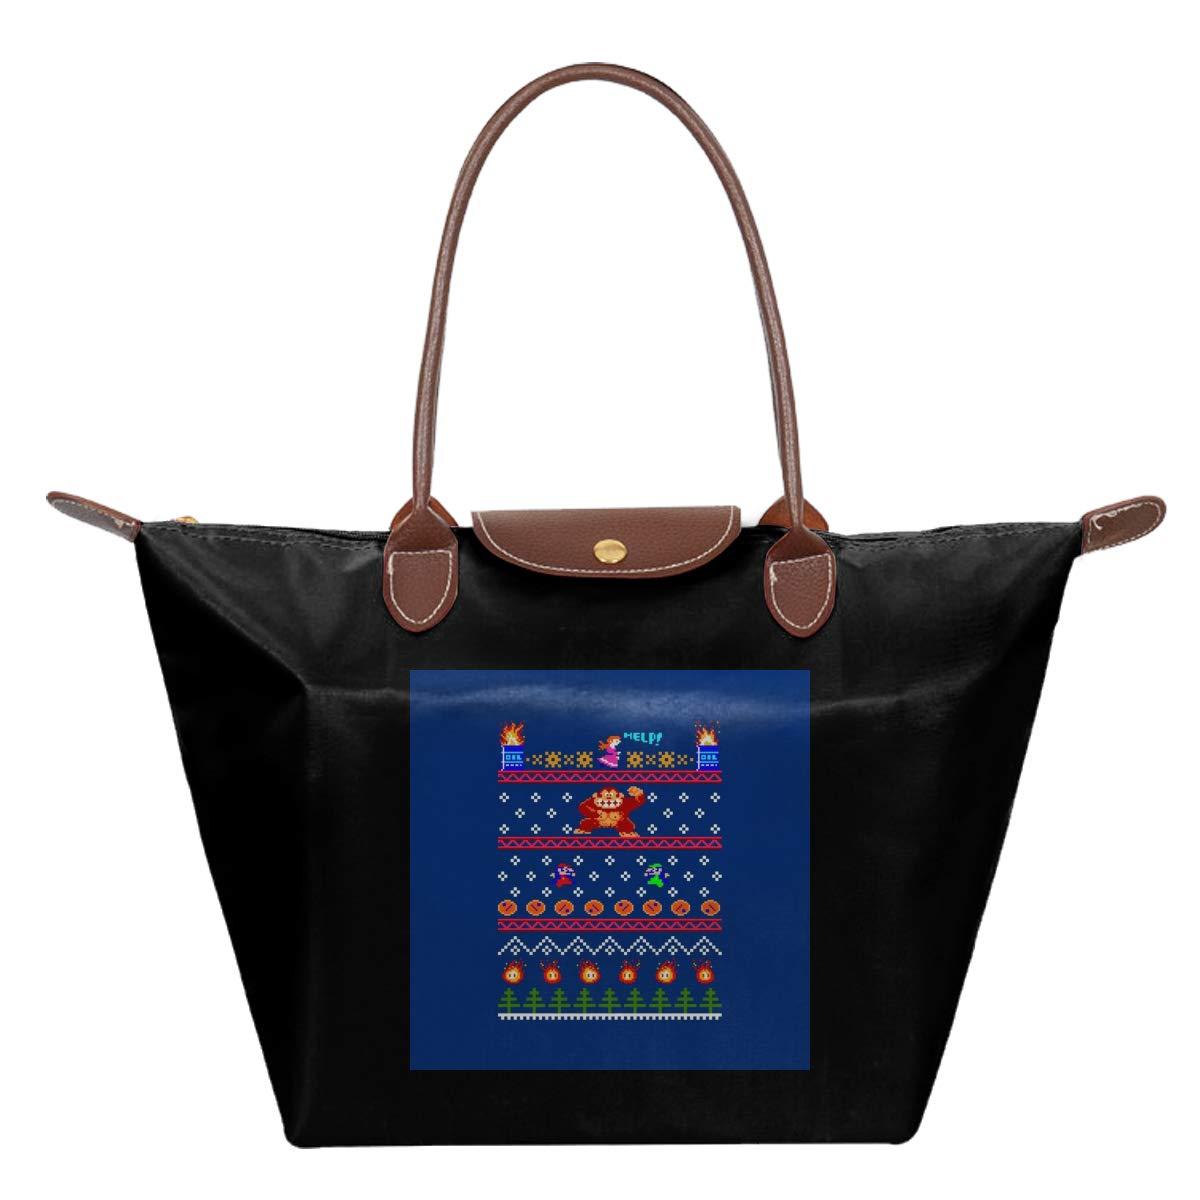 Donkey Kong Christmas Knit Pattern Waterproof Leather Folded Messenger Nylon Bag Travel Tote Hopping Folding School Handbags